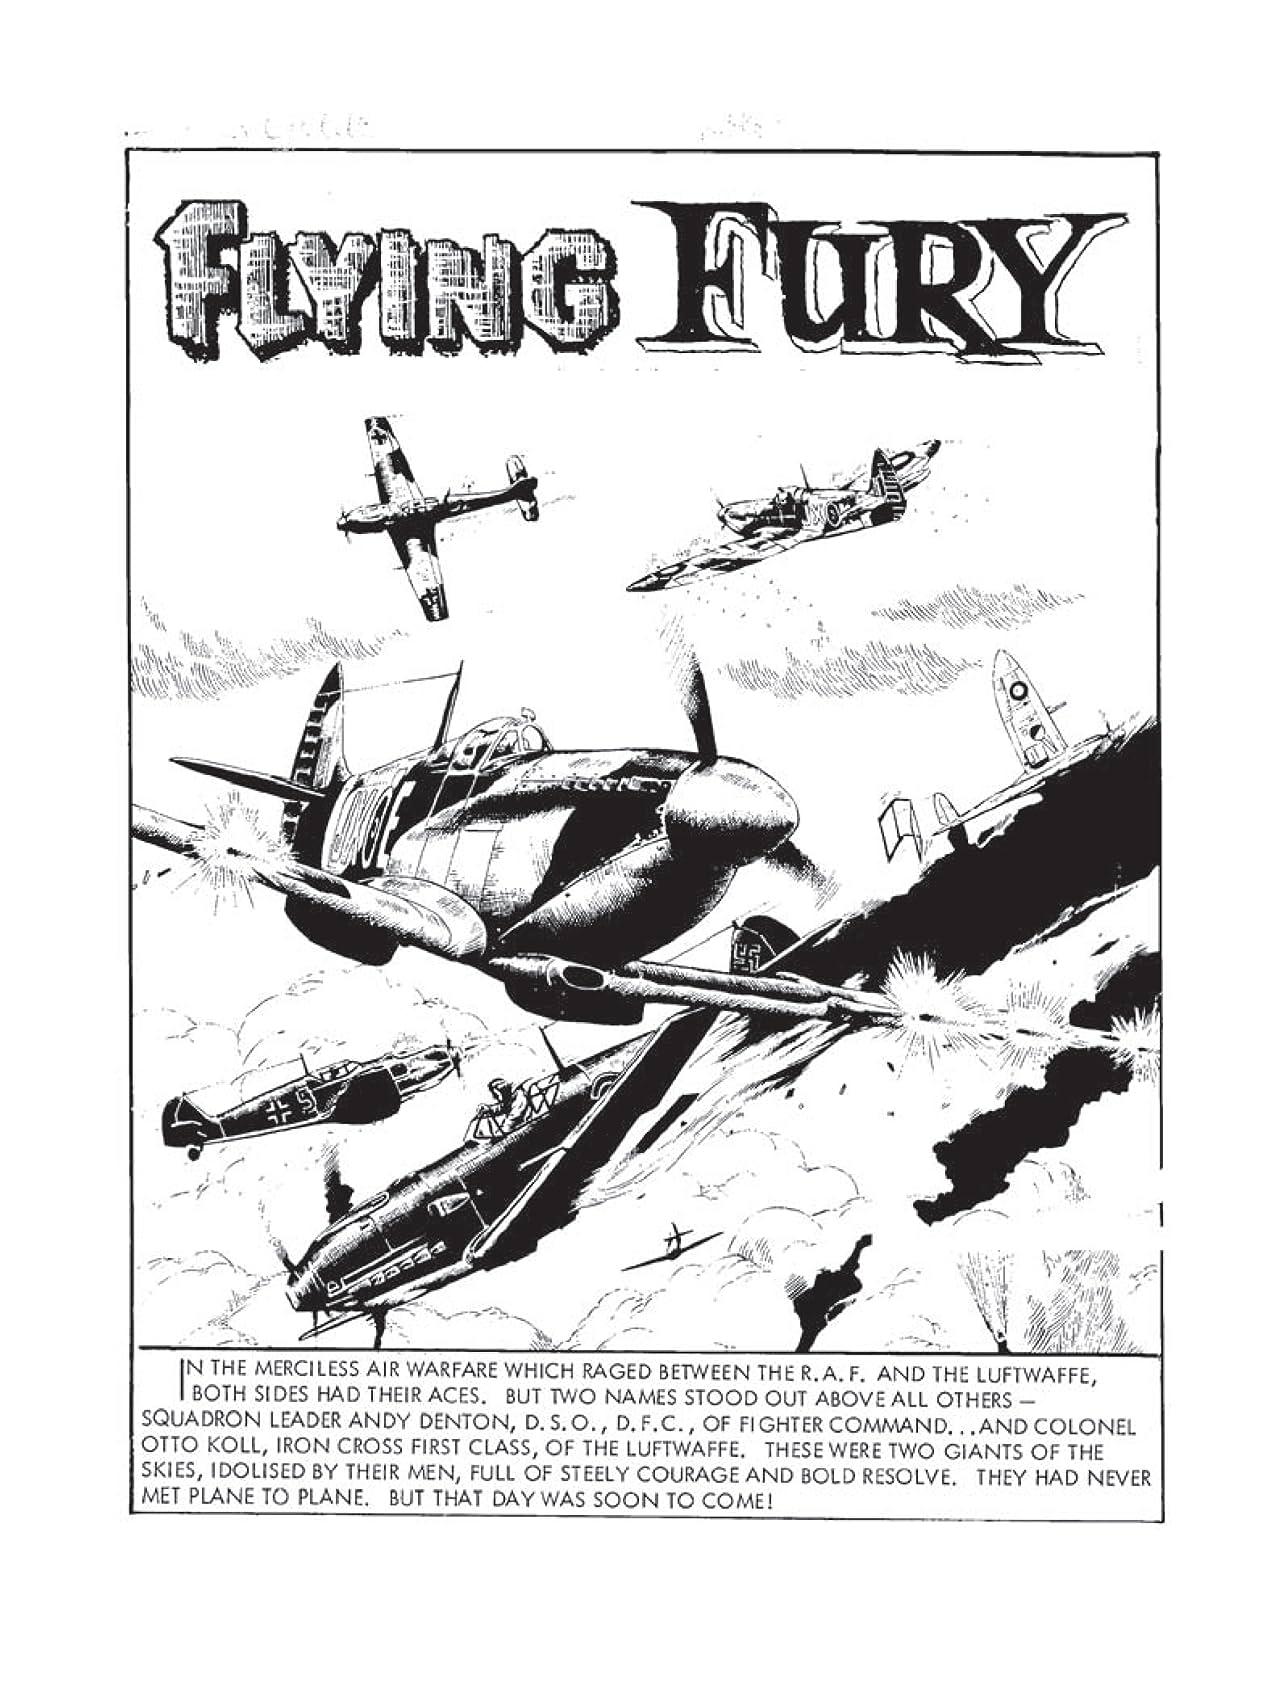 Commando #4360: Flying Fury